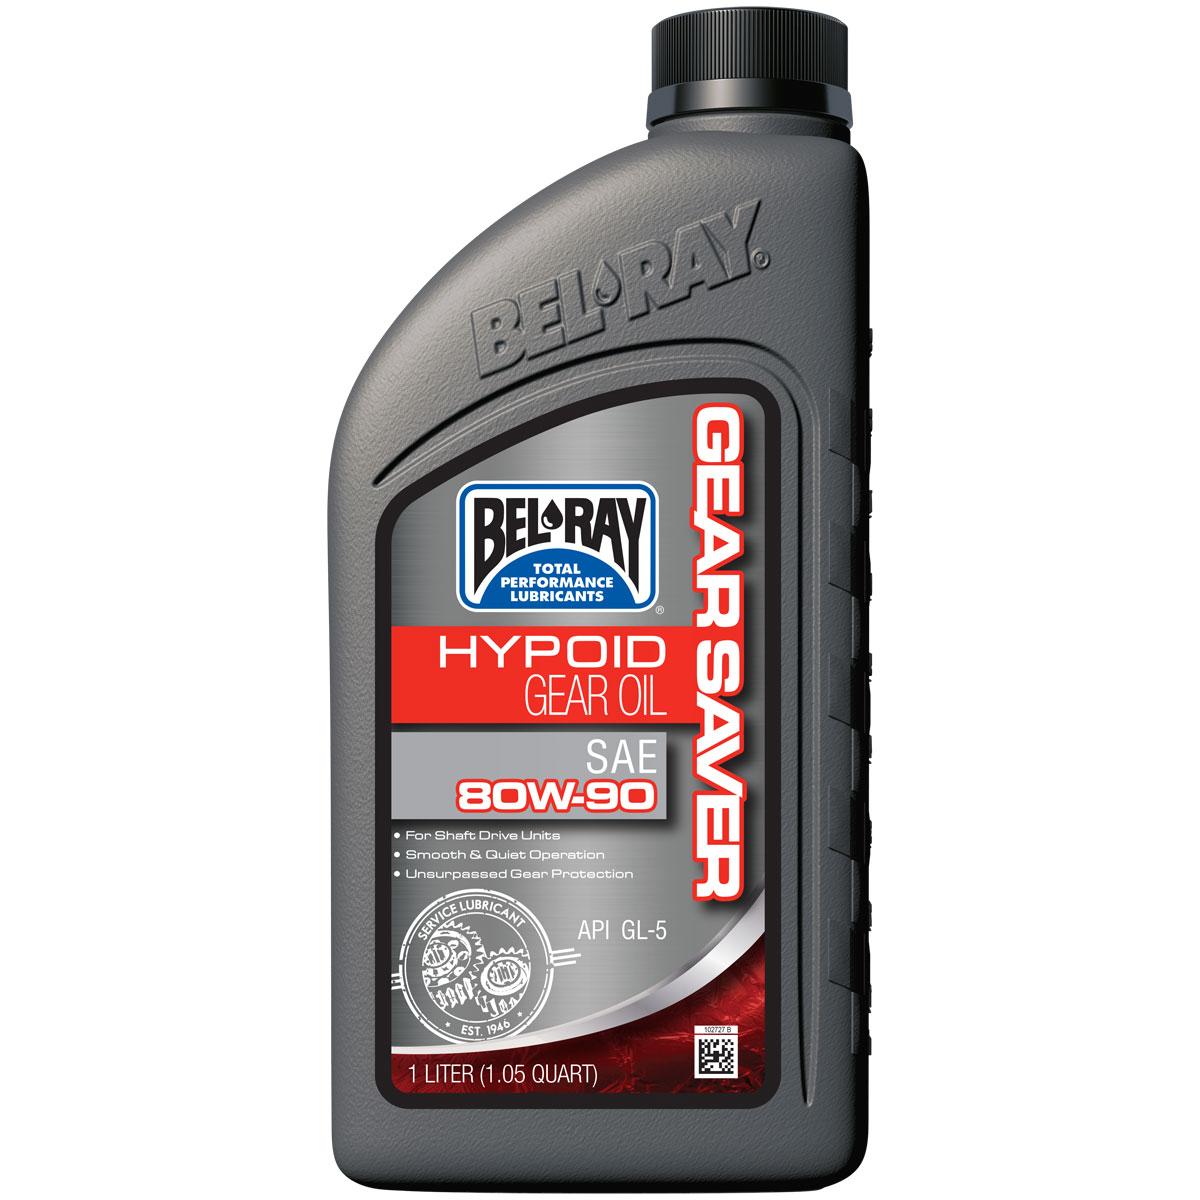 Bel-Ray Gear Saver 80W90 Hypoid Gear Oil Liter